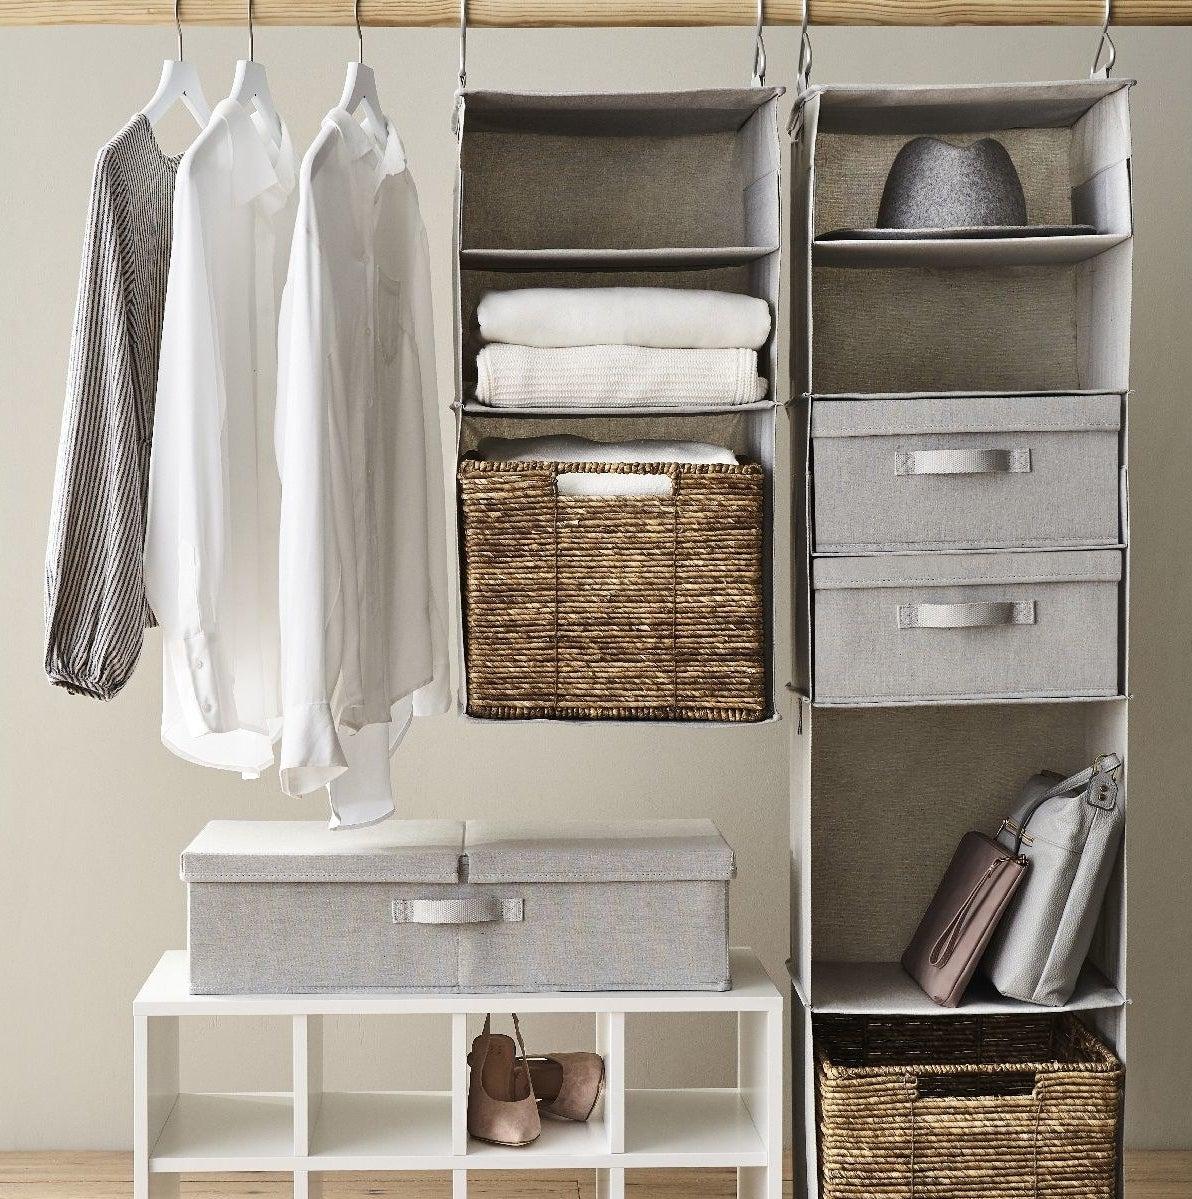 A pretty grey box in a closet with all neutral shades